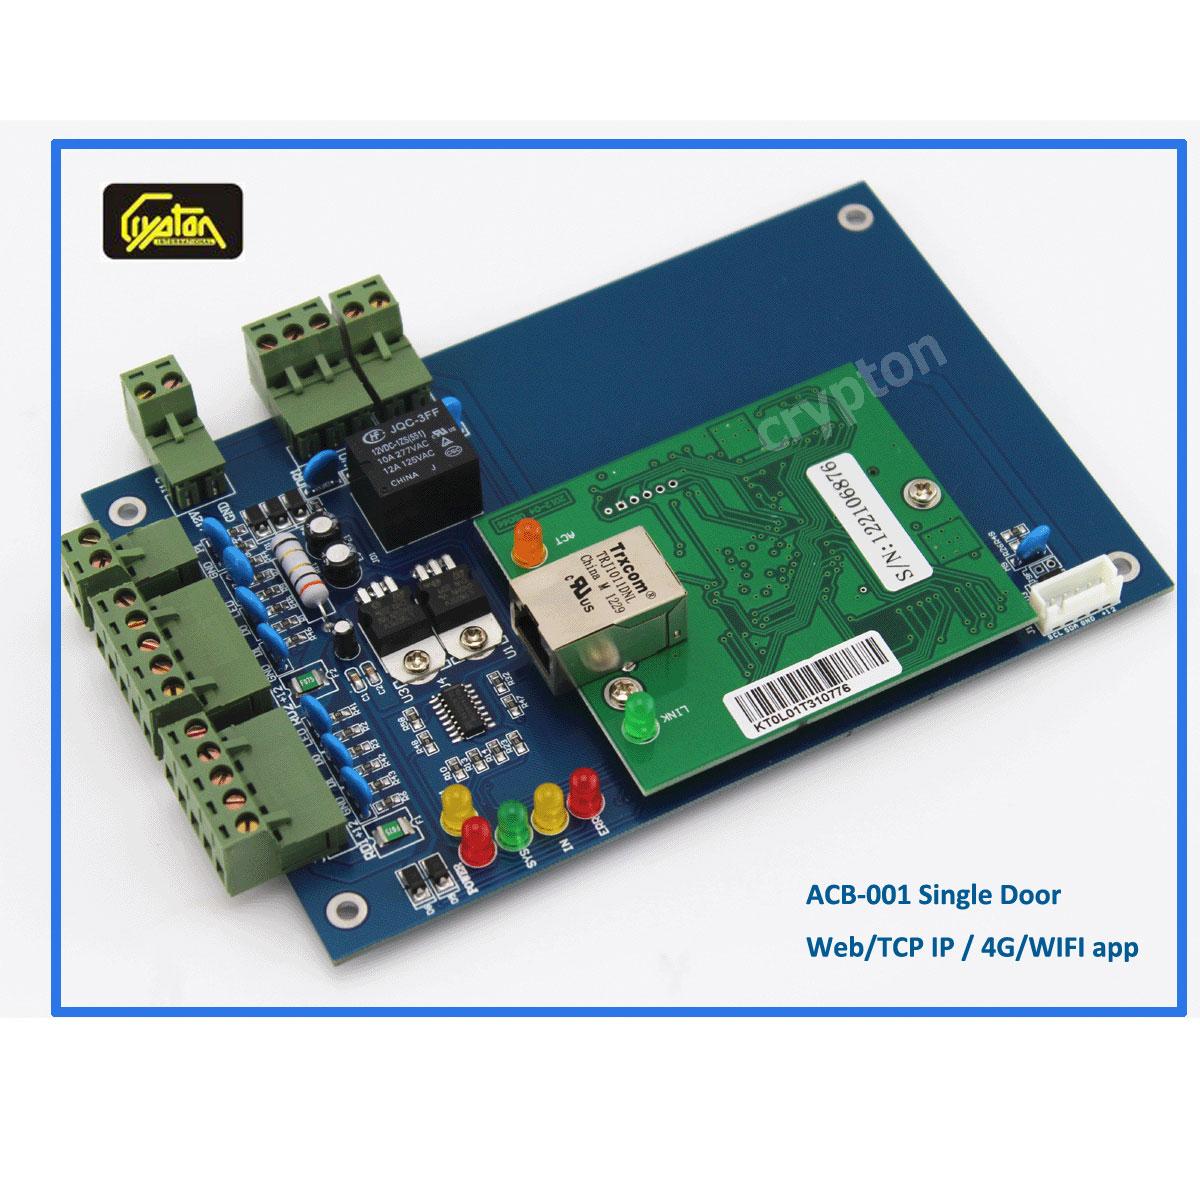 ACB-001 Singel door access control system